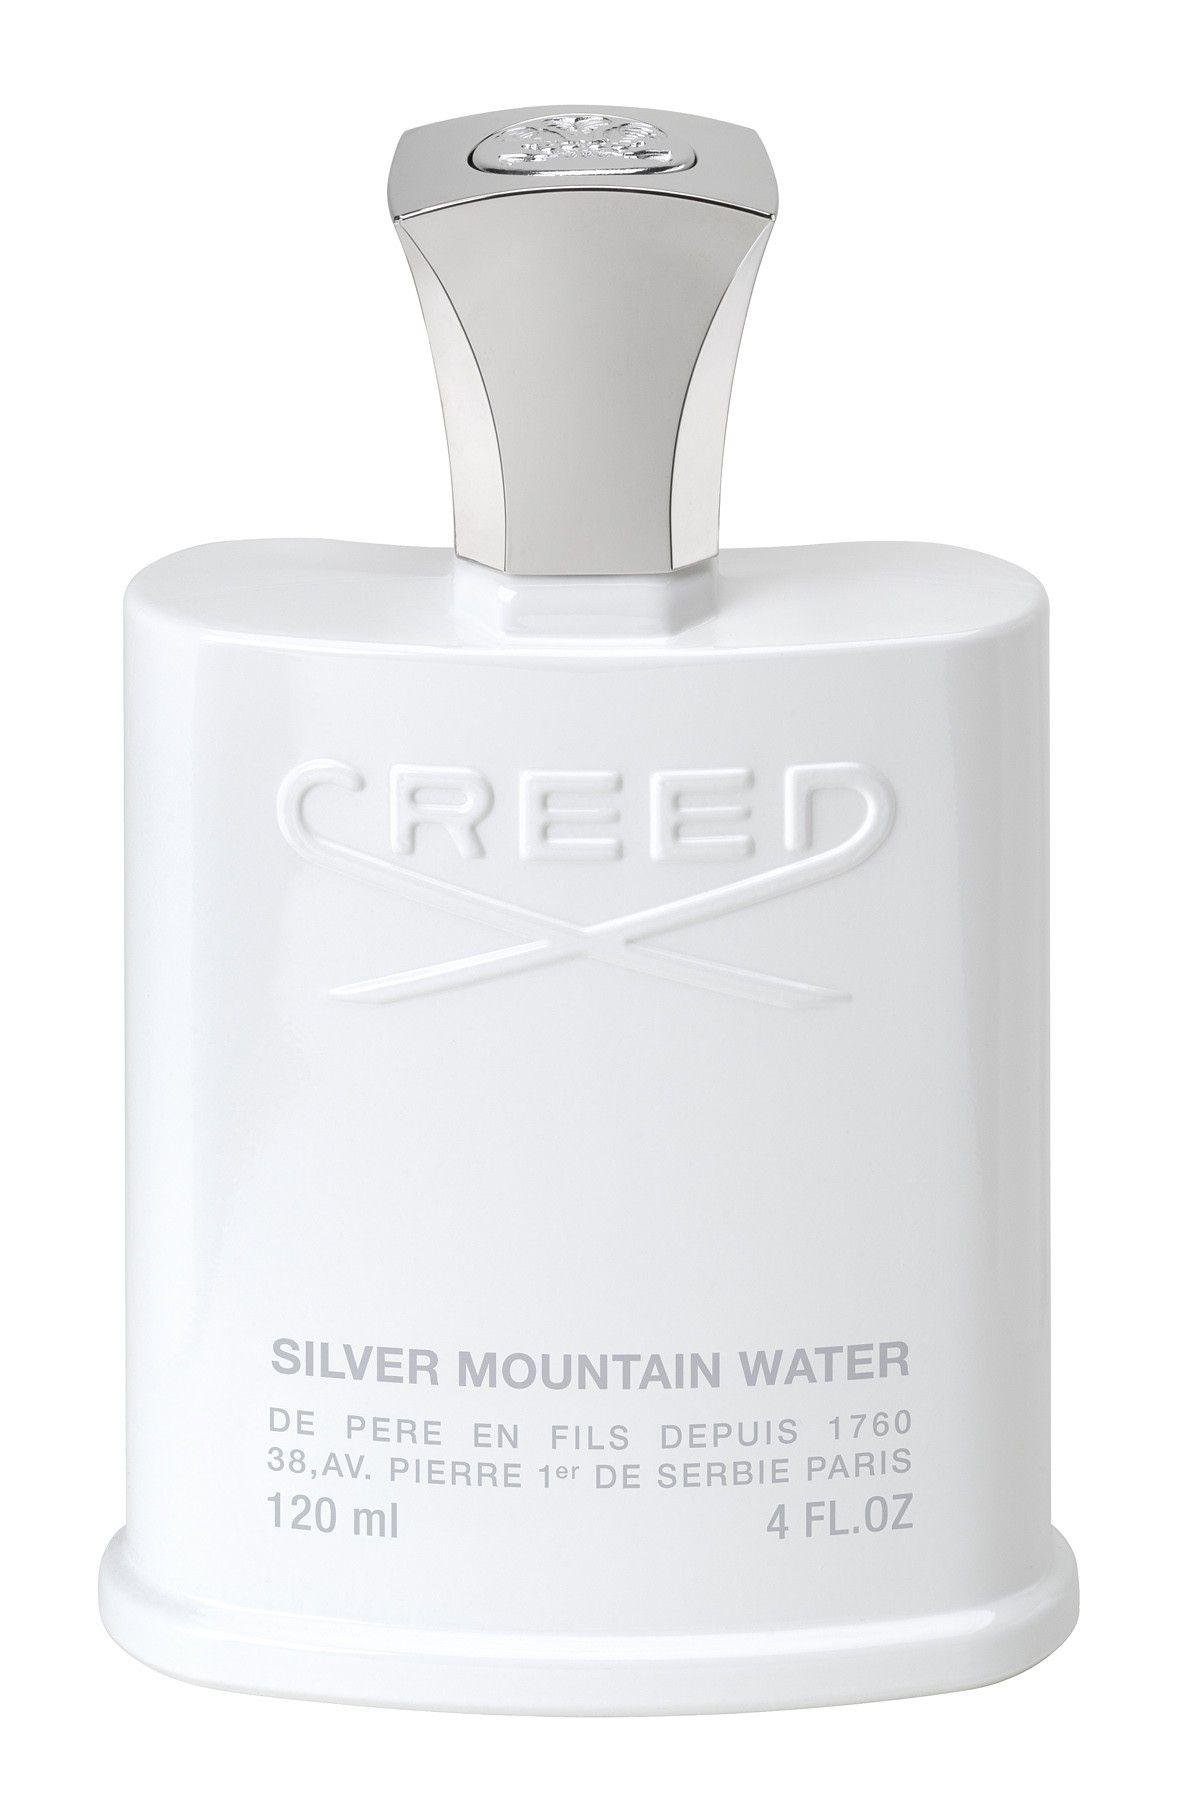 Silver Mountain Water Creed Perfume Perfume Creed Fragrance